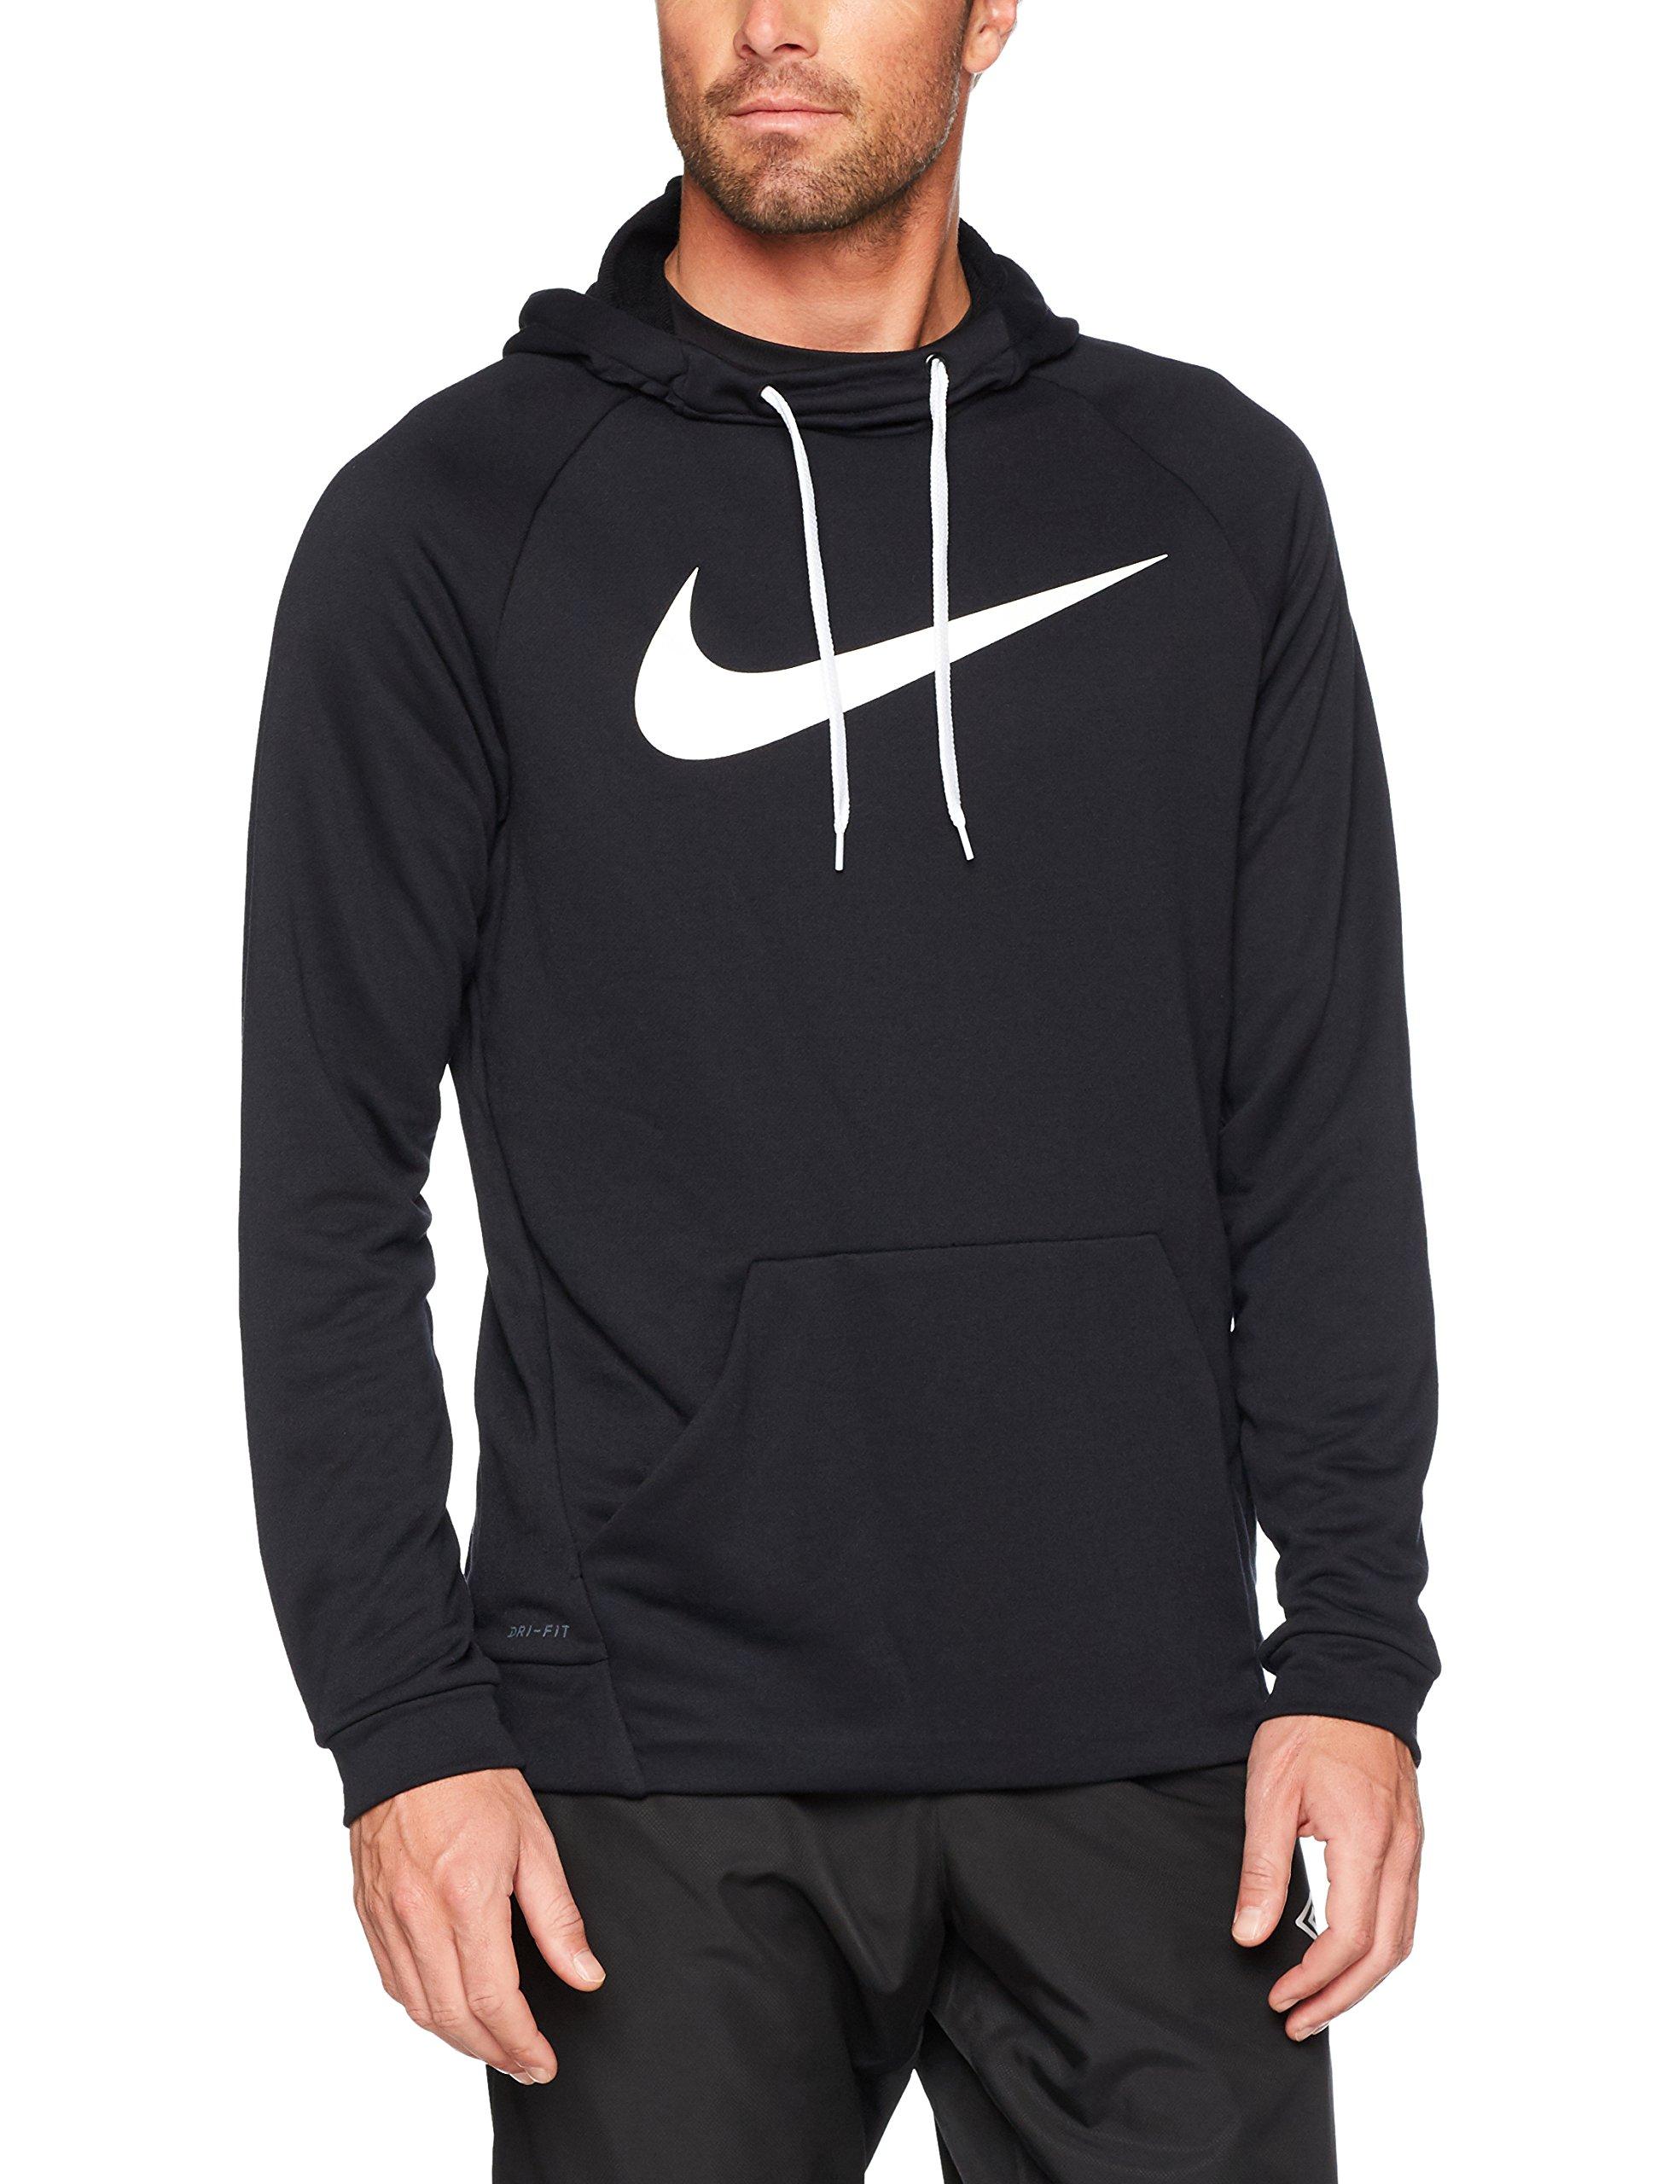 NIKE Men's Dry Pullover Swoosh Hoodie, Black/White, XX-Large